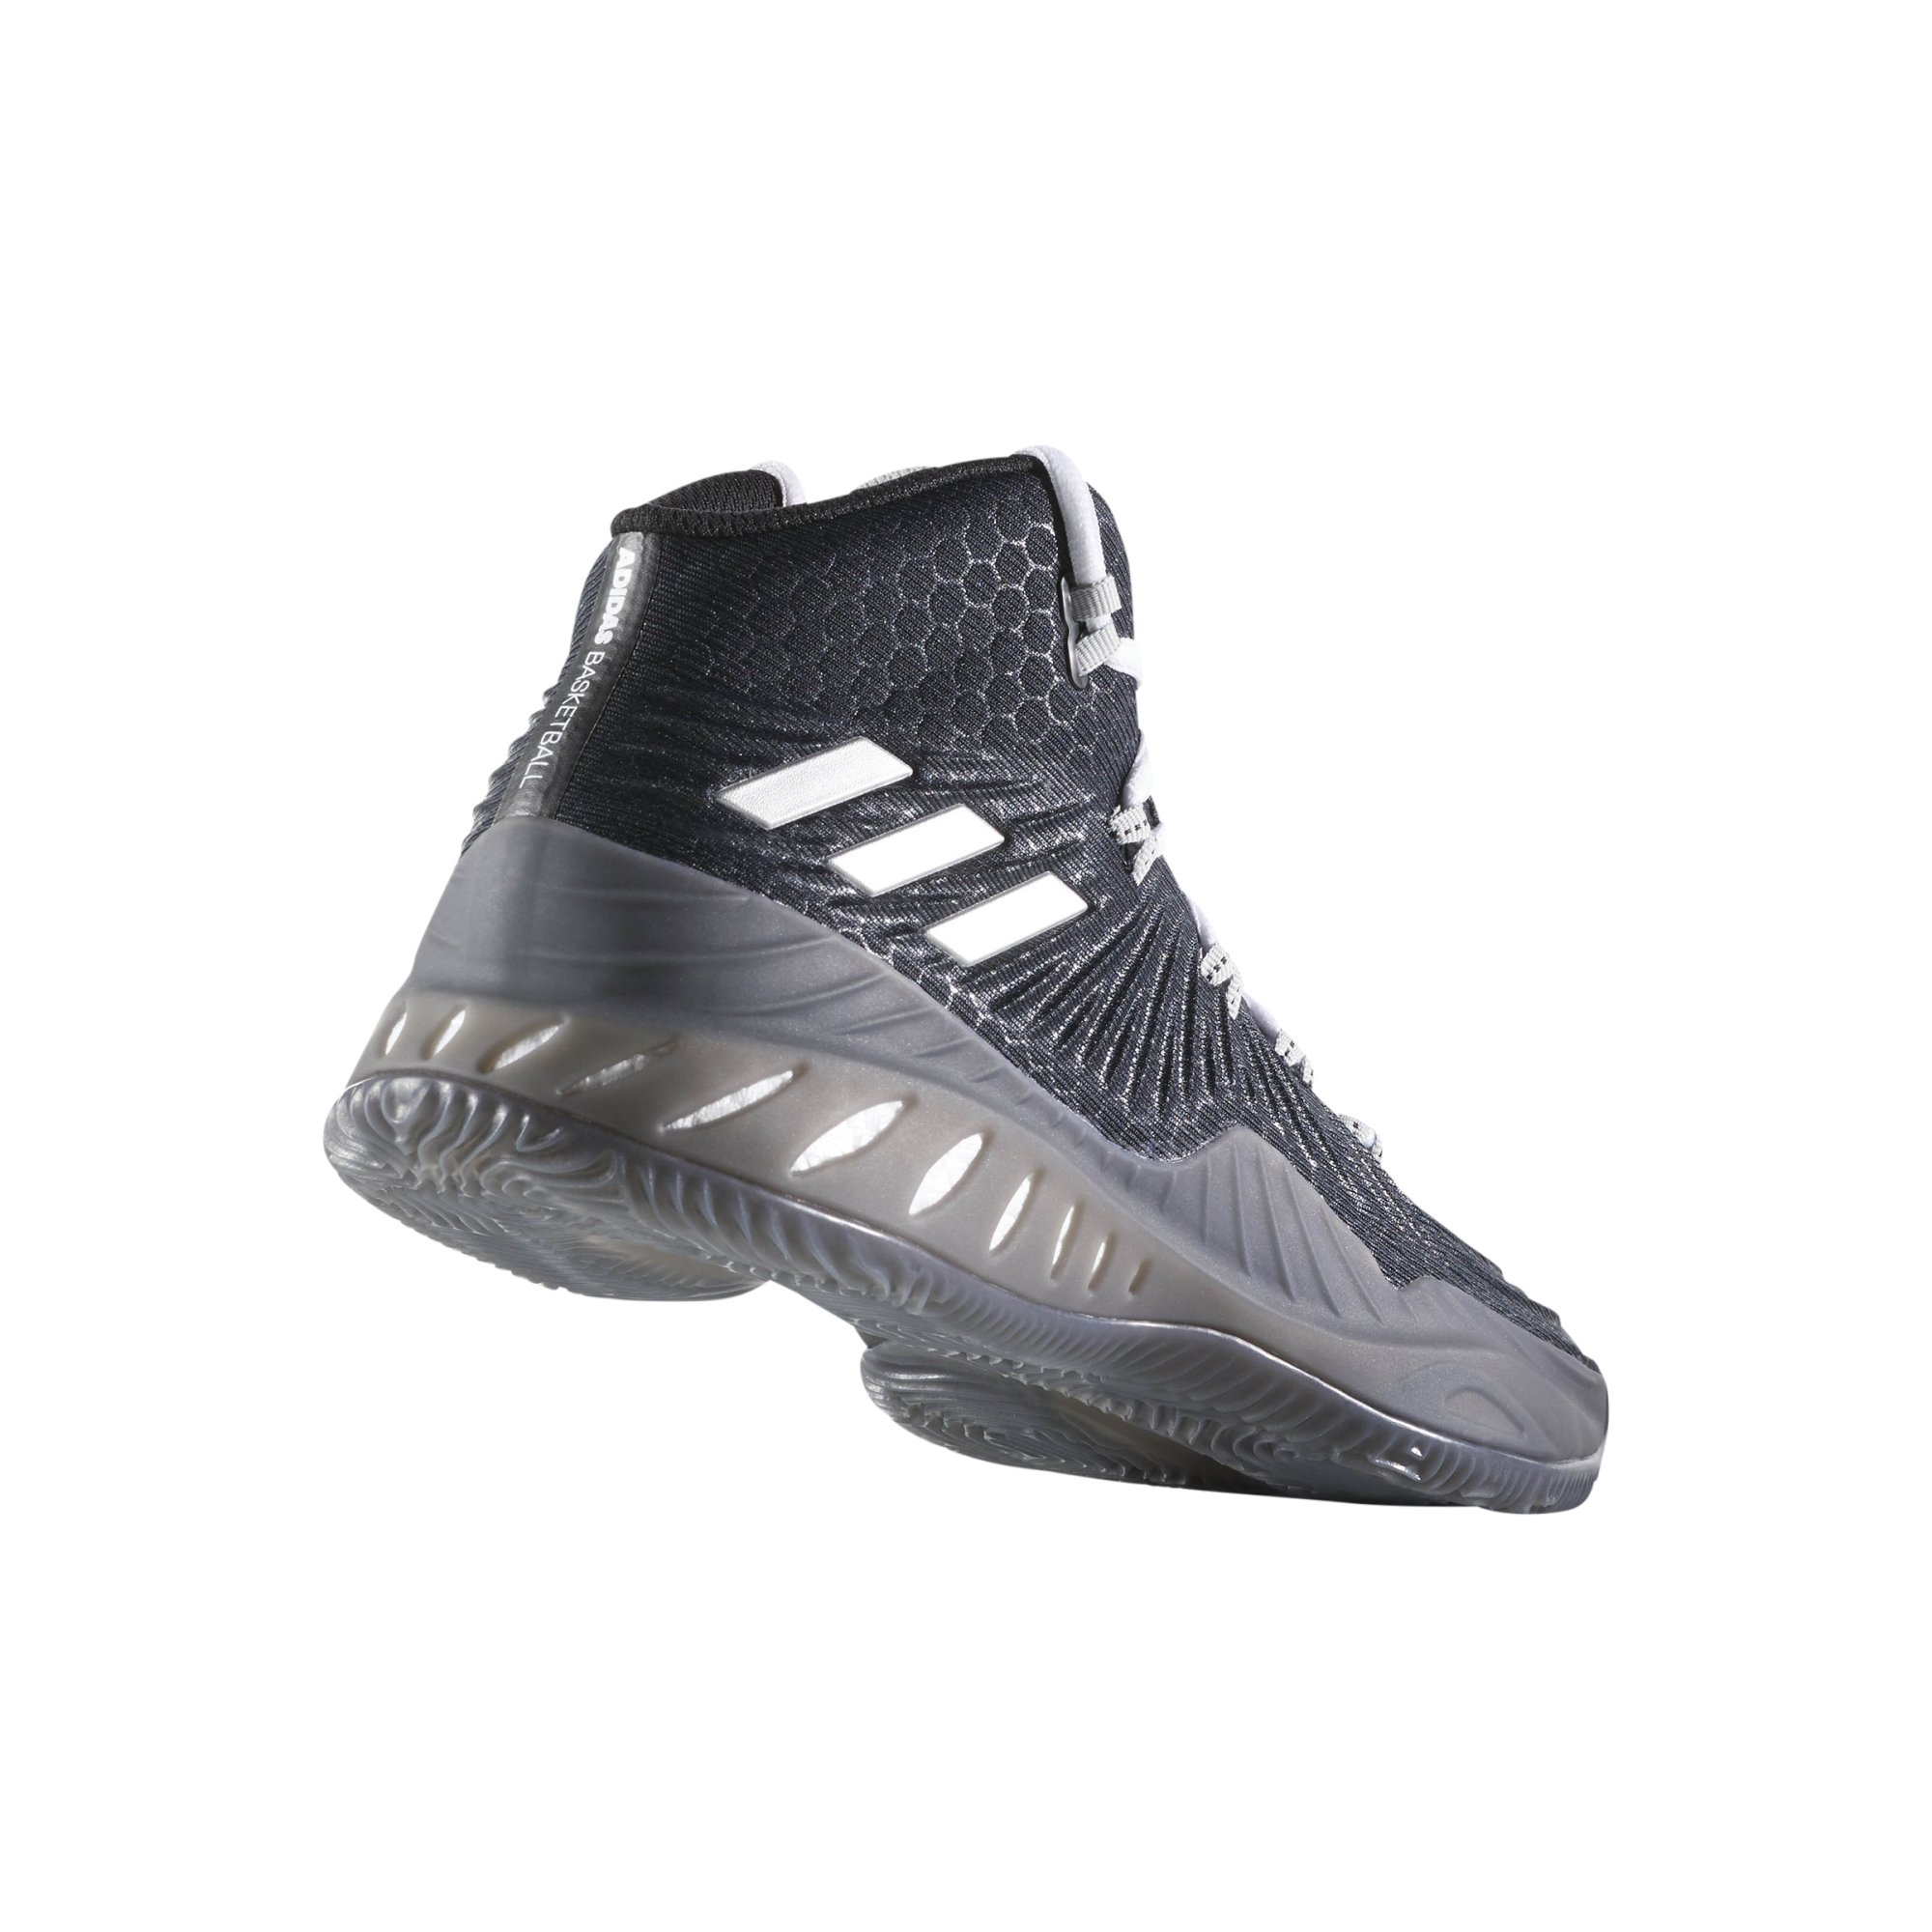 hot sale online 83413 f3b8e ... Adidas Crazy Explosive 2017